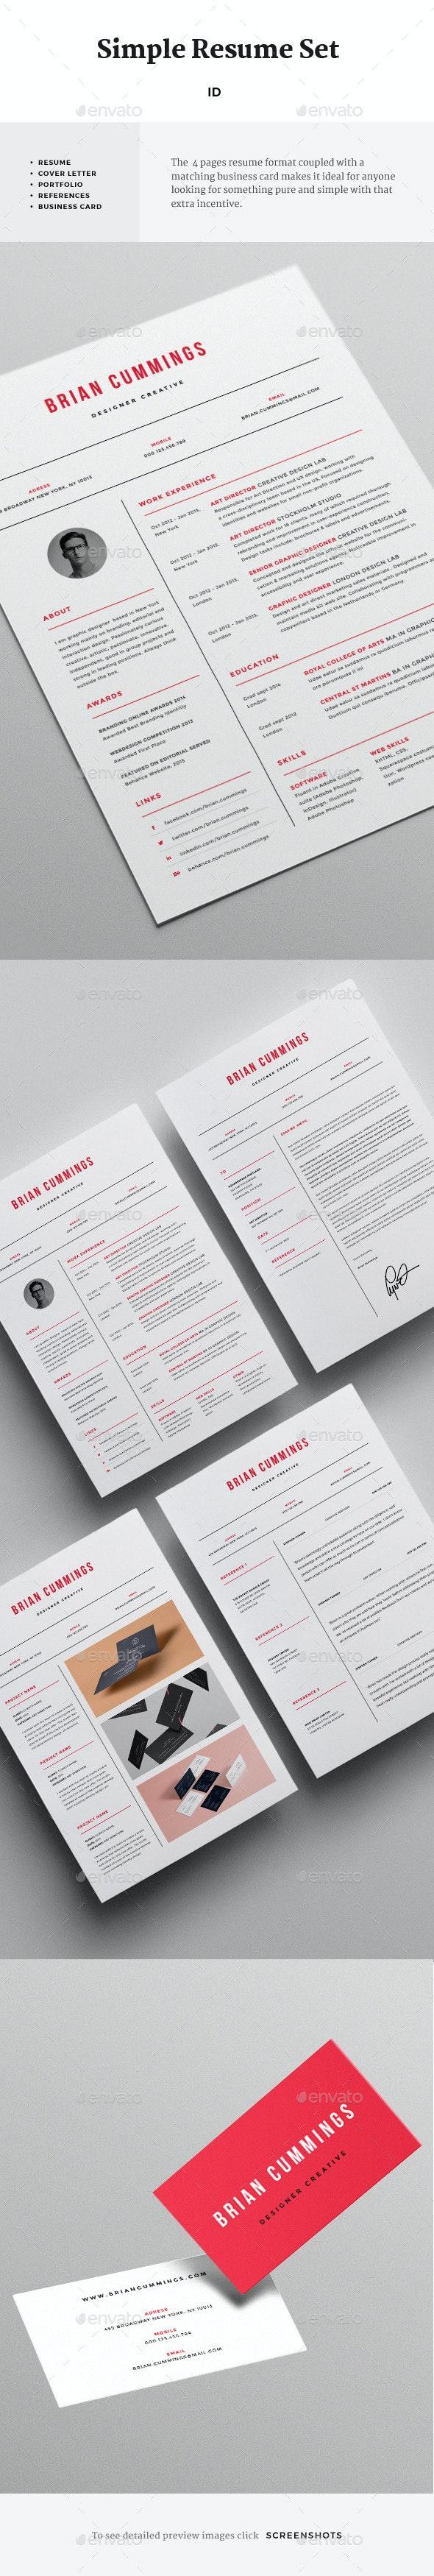 Simple Resume Set - Resumes Stationery